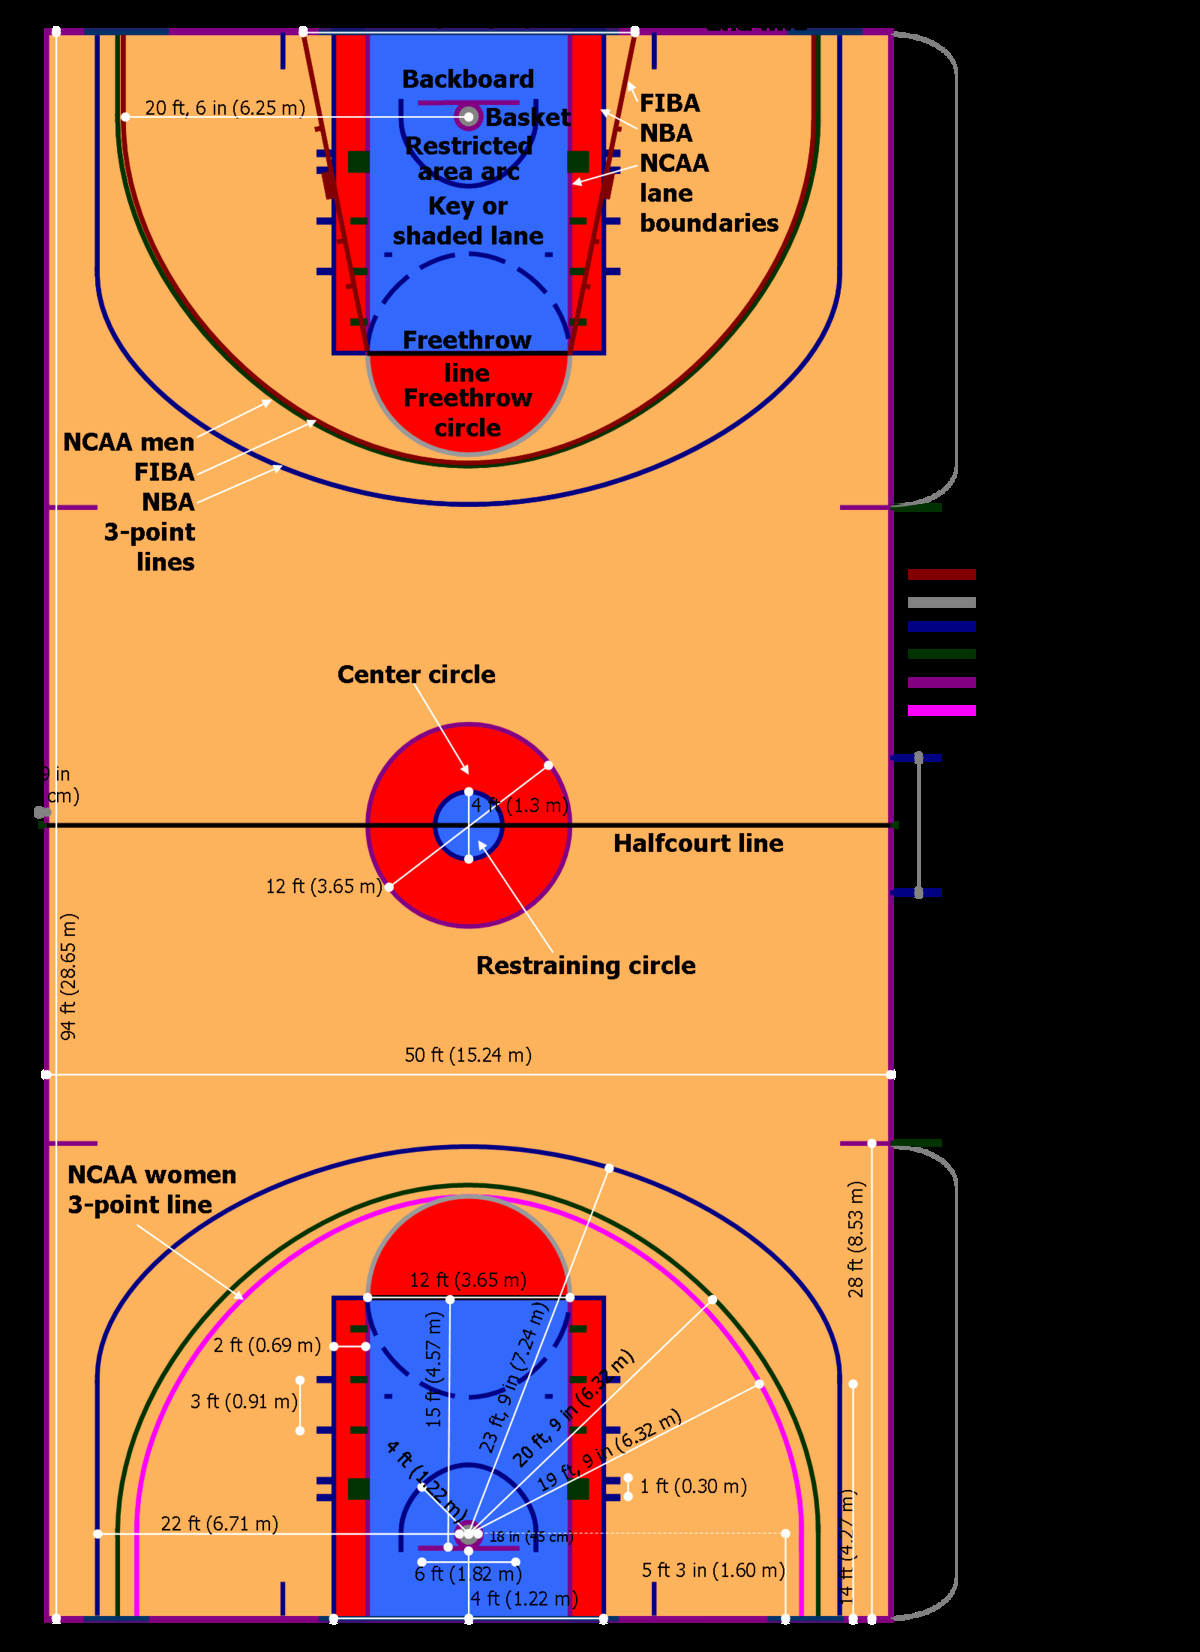 Youth Basketball Court Dimensions Diagram New Koš Poen — Википедија слободна енциклопедија